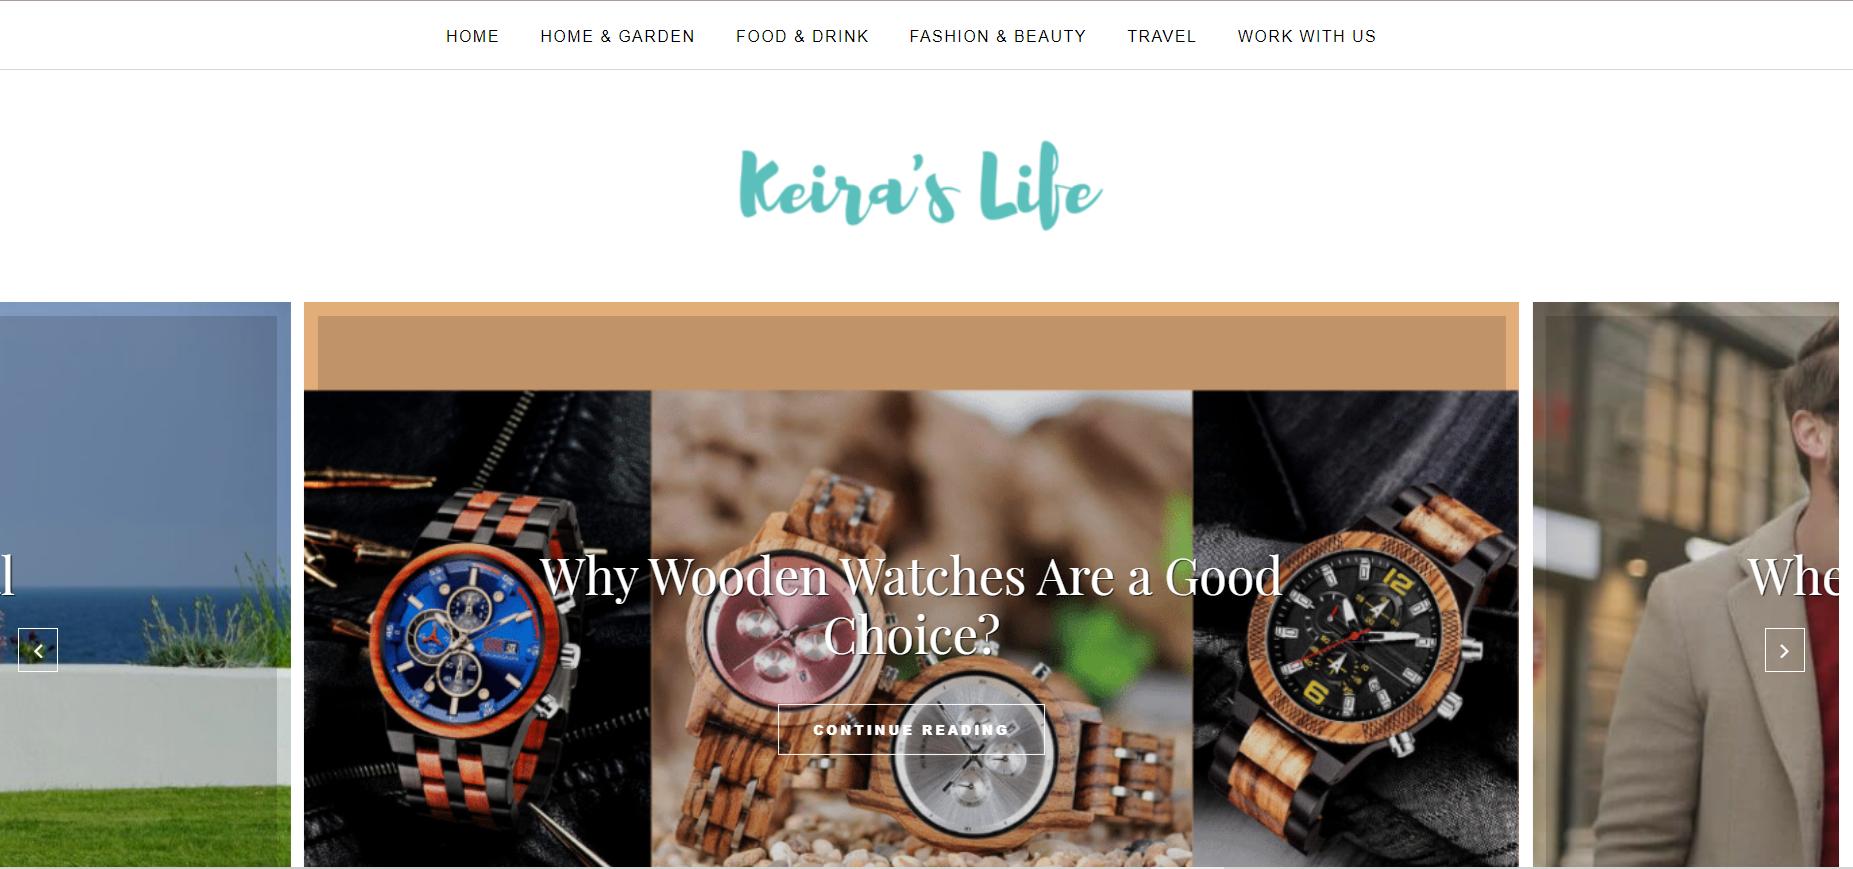 Keira's Life